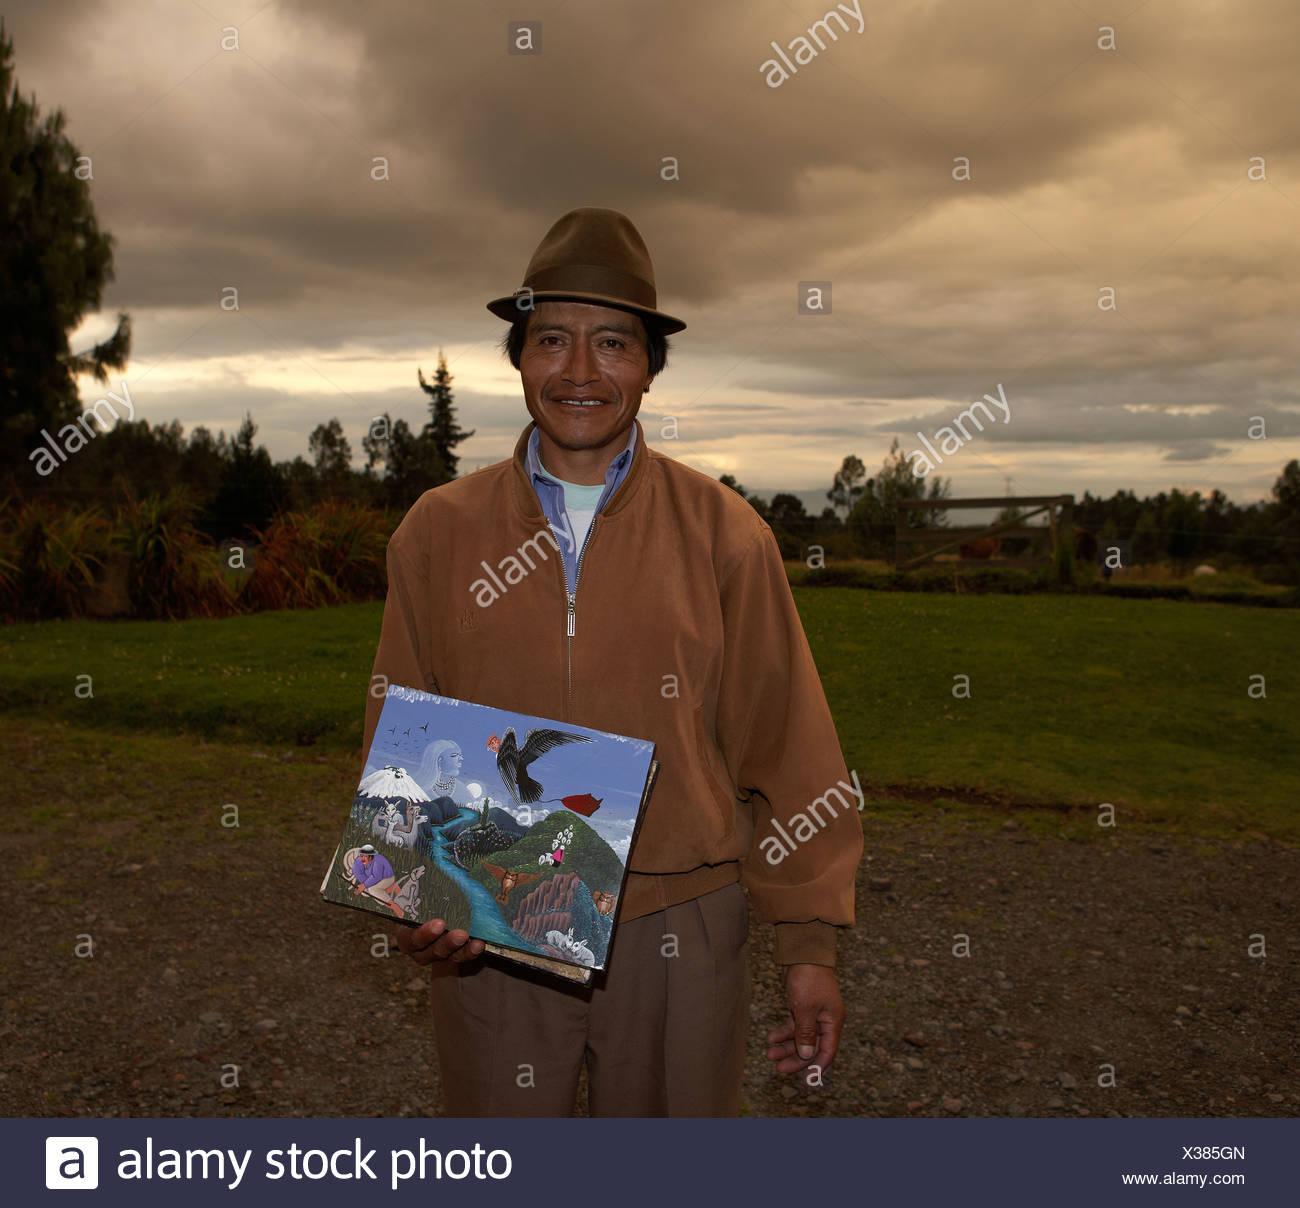 Pedro Vega ToaQuiza painter in the Andes Mountains, Ecuador - Stock Image